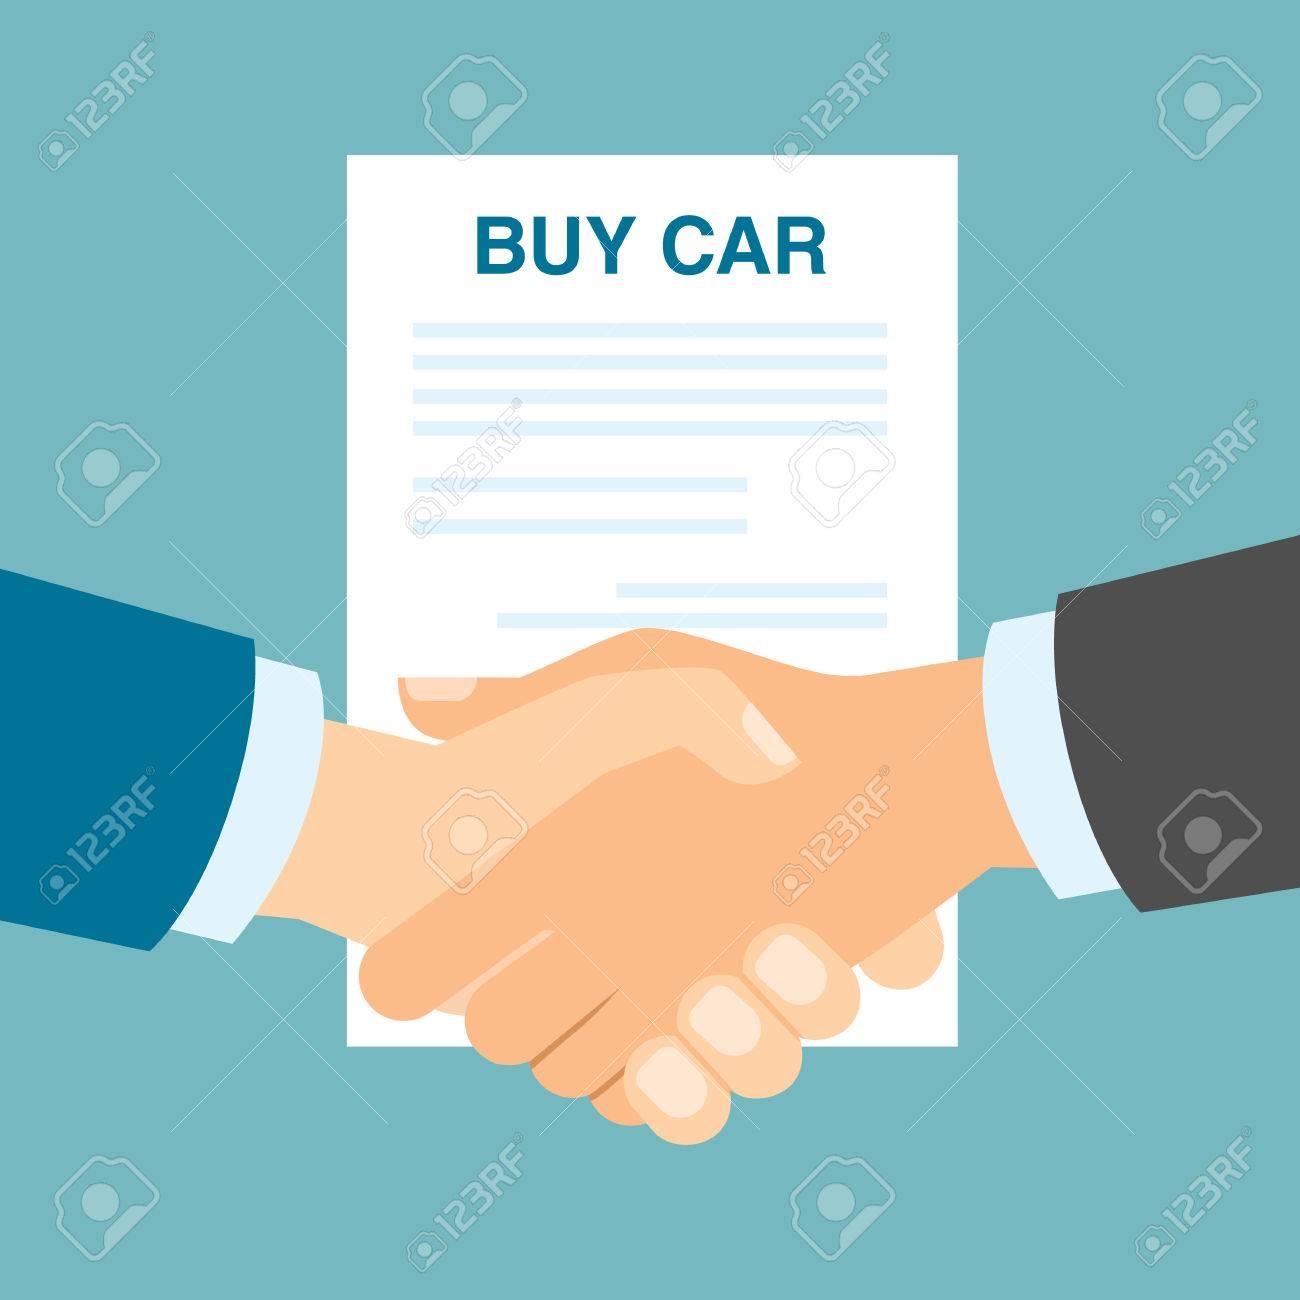 Buy Car Contract Handshake Men Shaking Hands In Agreement About